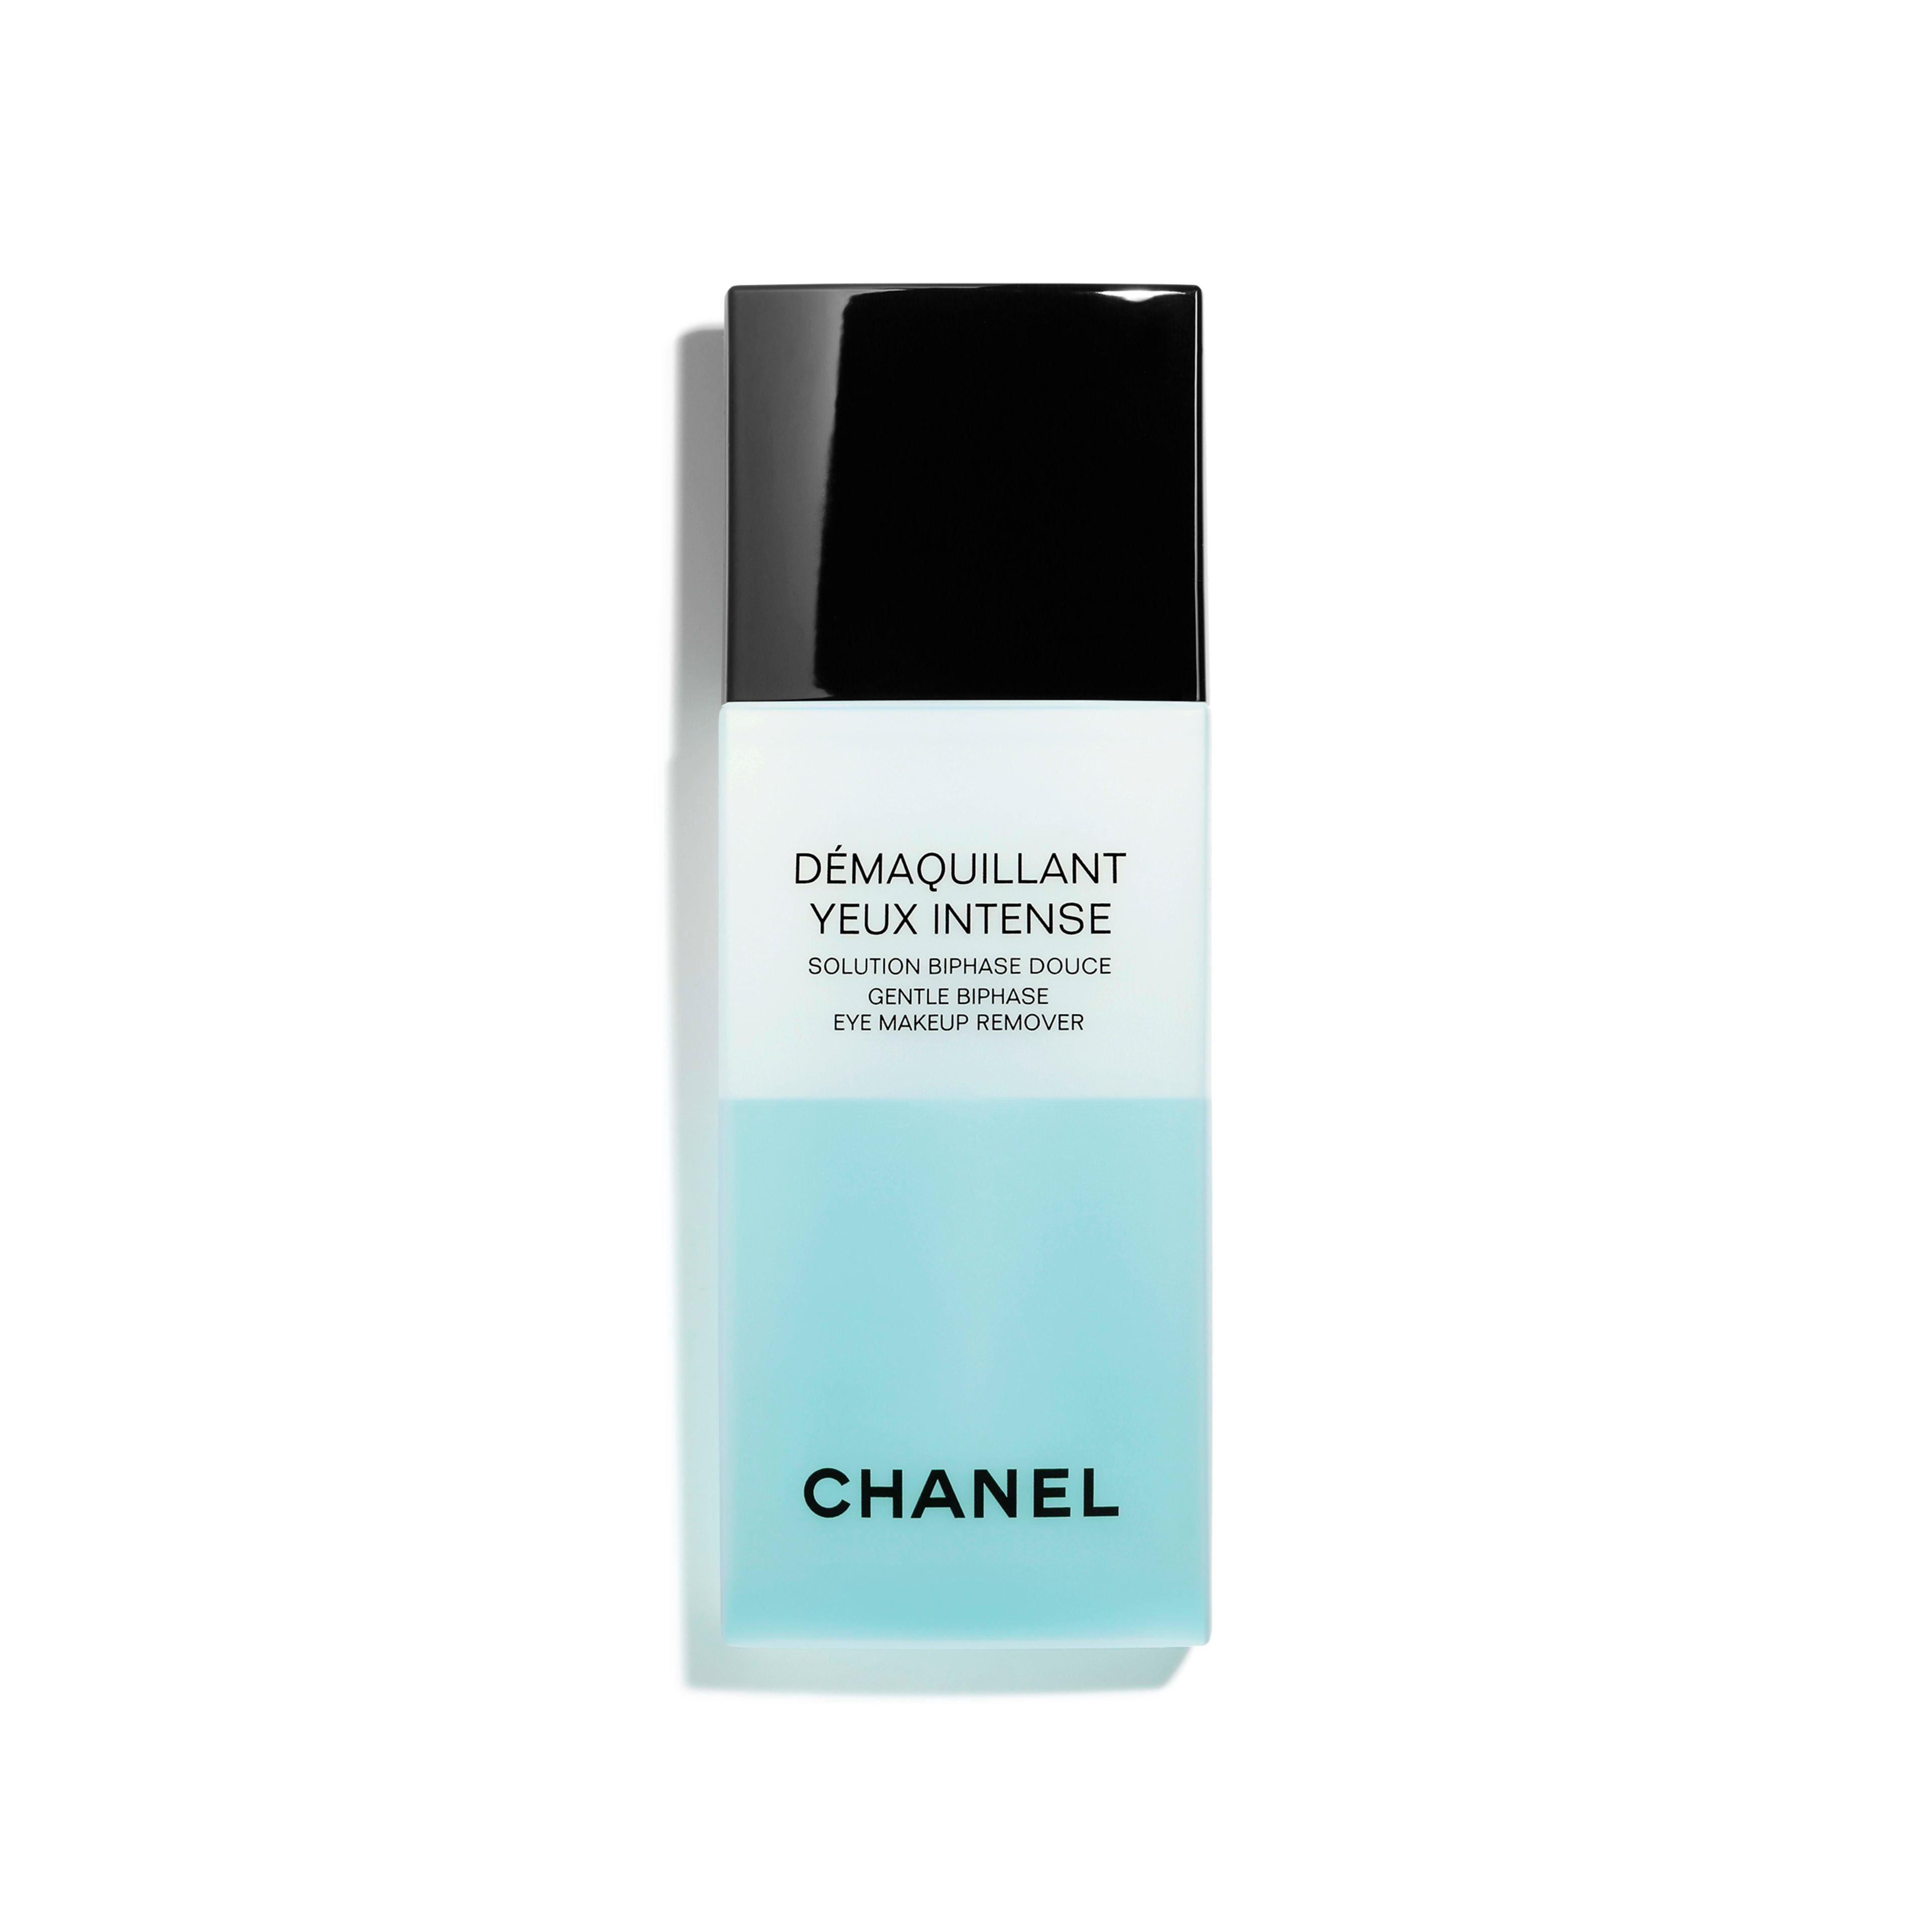 Chanel DEMAQUILLANT YEUX INTENSE Gentle BiPhase Eye